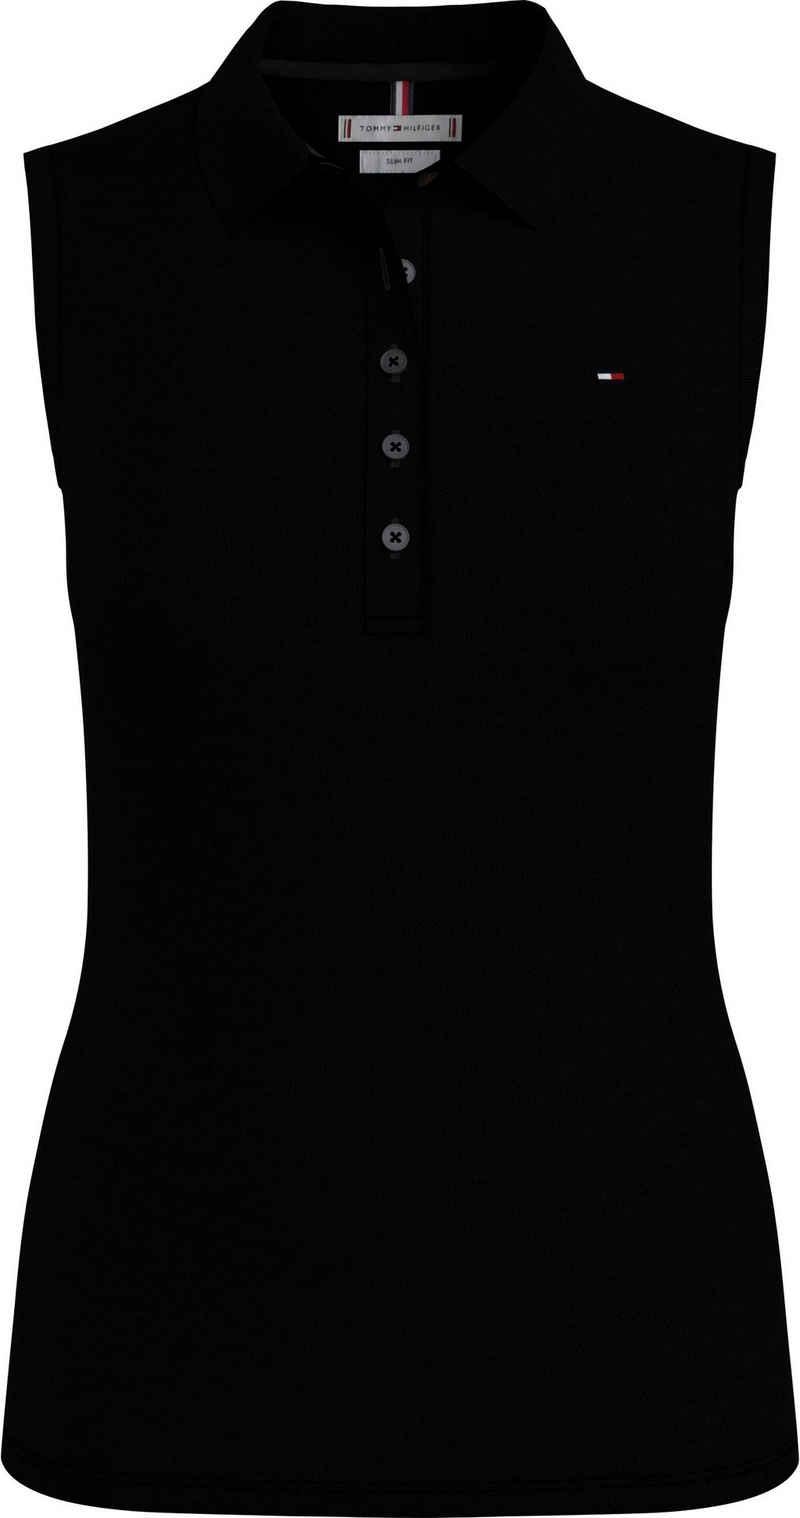 Tommy Hilfiger Poloshirt »Slim Polo No Sleeve« mit Tommy Hilfiger Logo-Falg auf der Brust